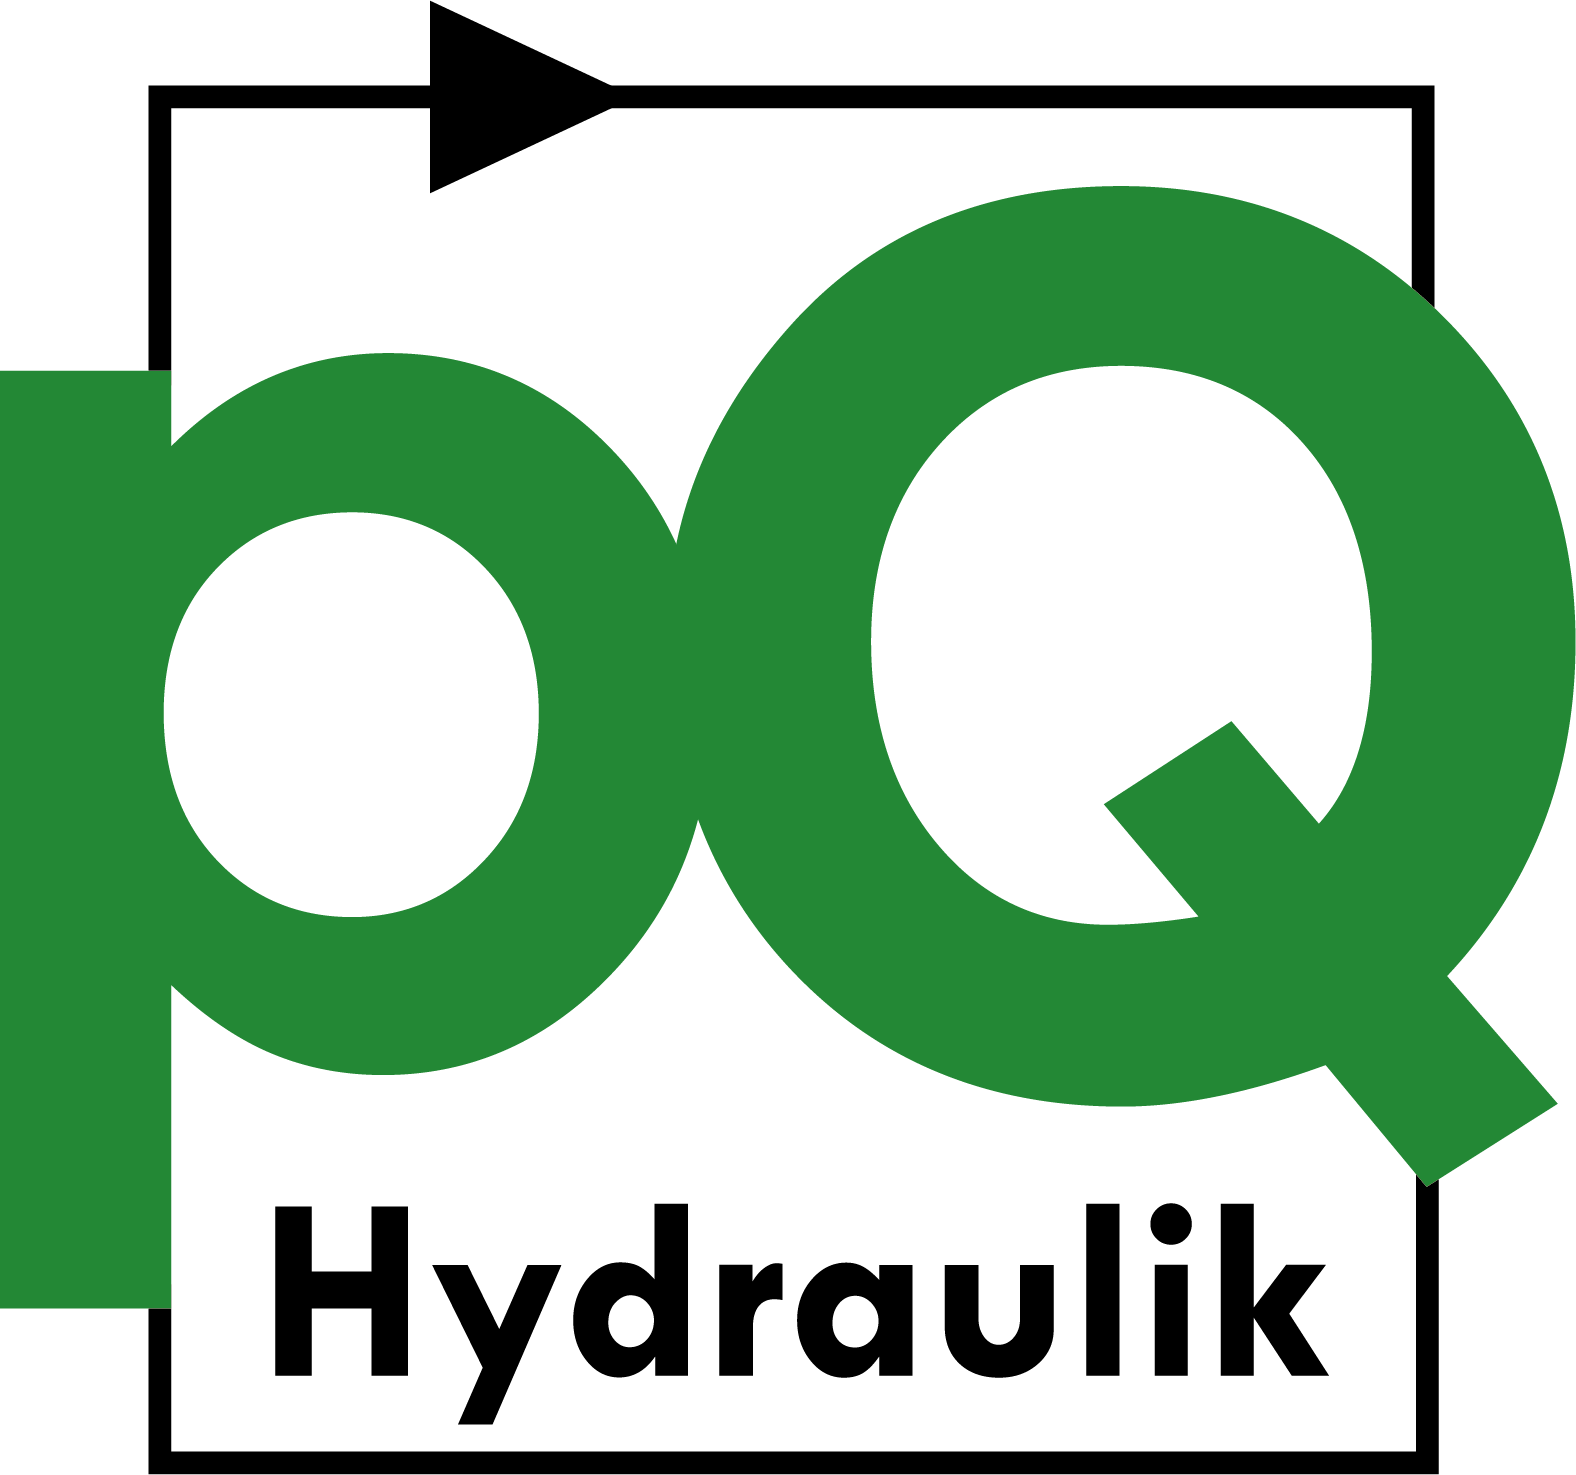 pQ-hydraulik.com